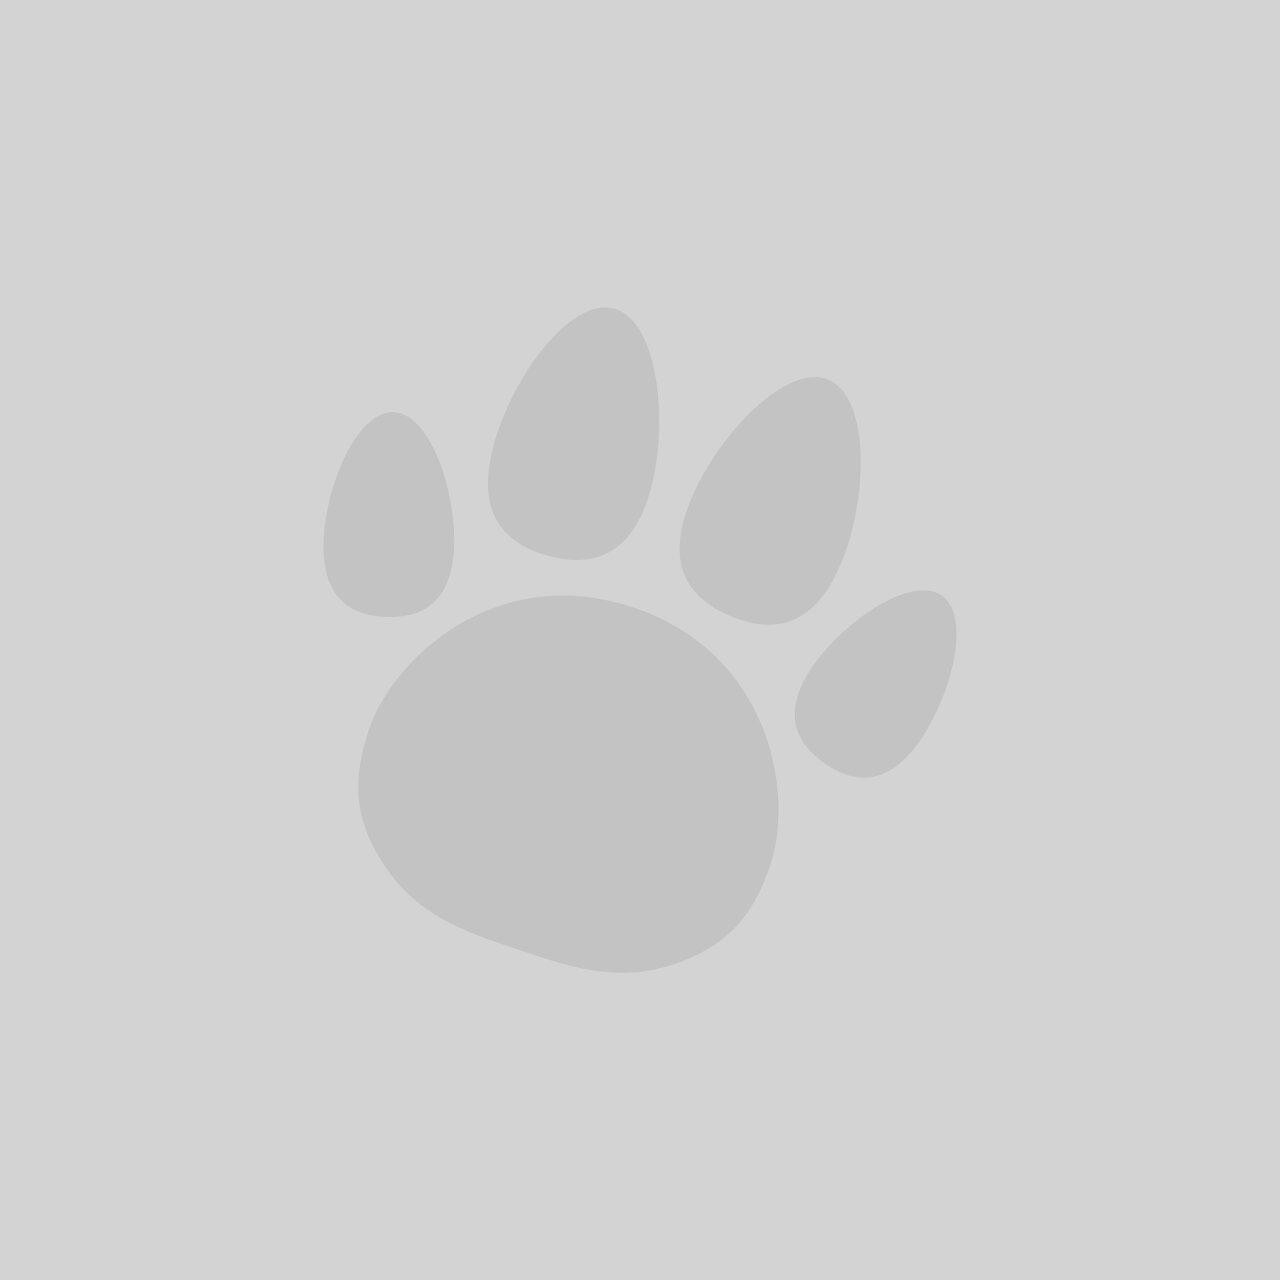 Four Paws Petaid Anti-Itch Spray 237ml